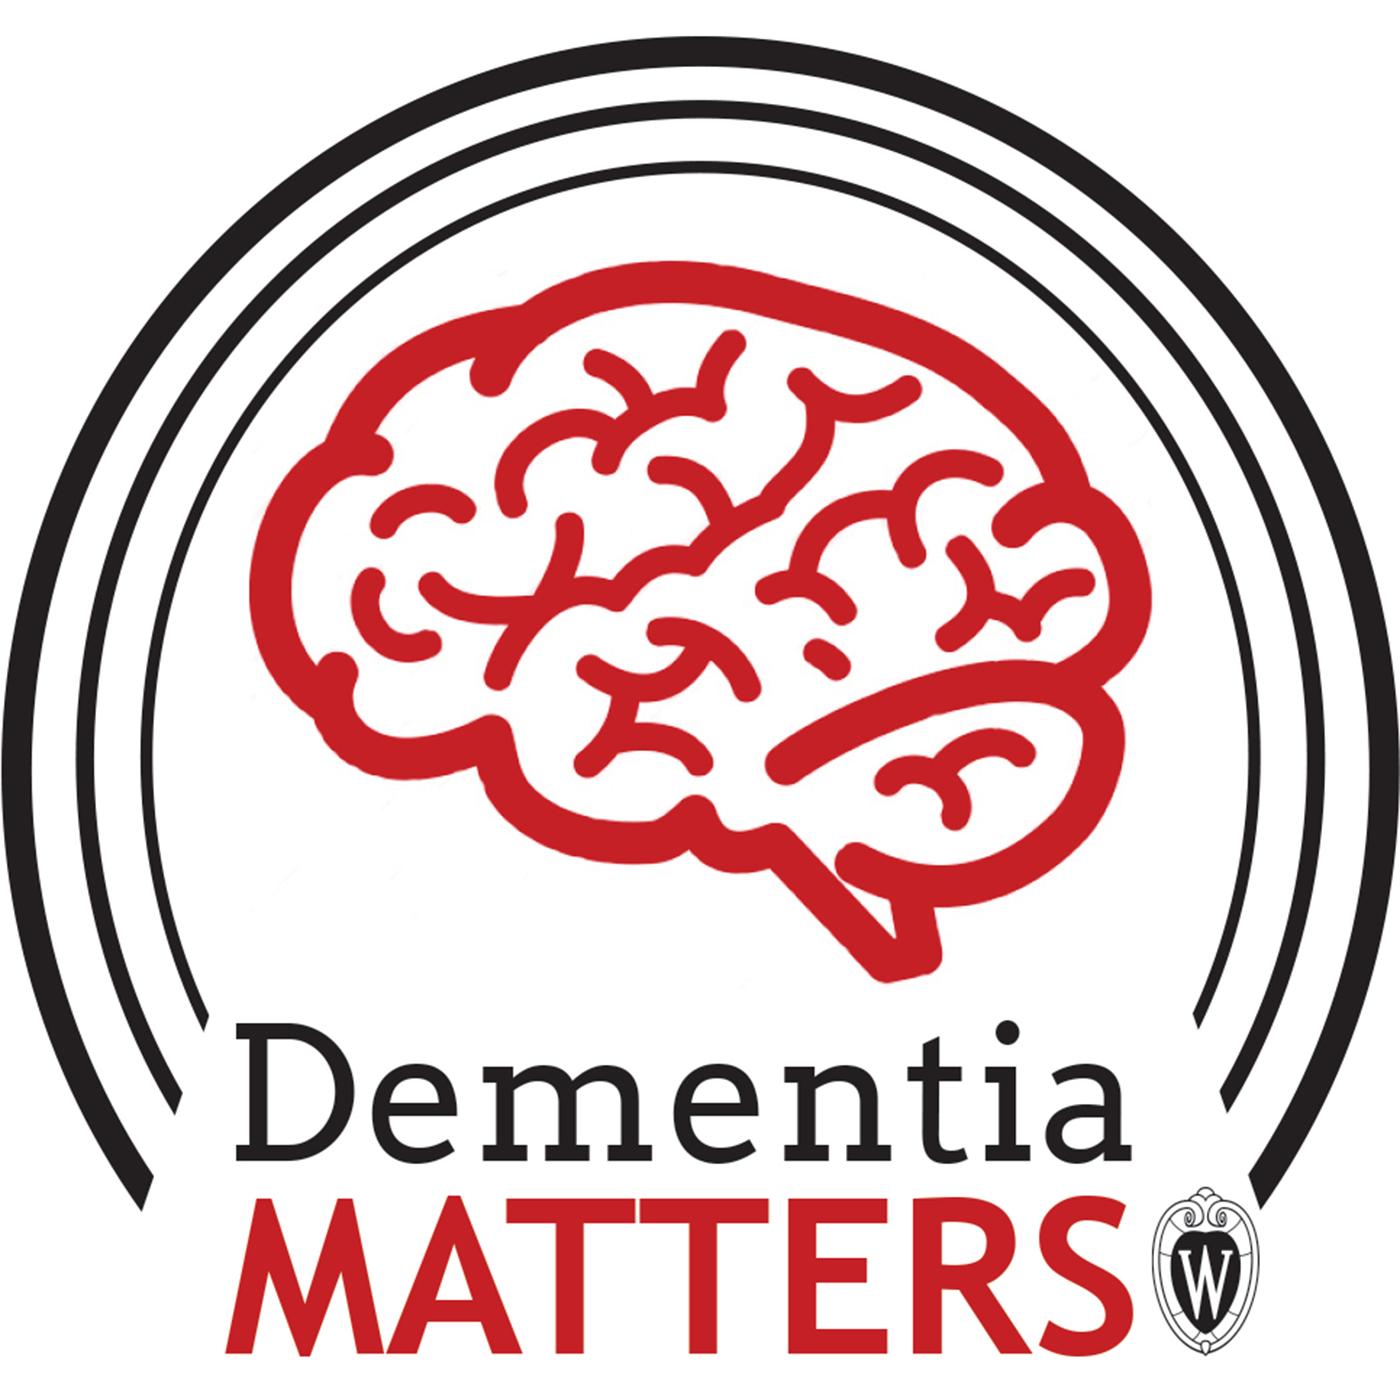 Dementia_Matters_podcast_logo.png